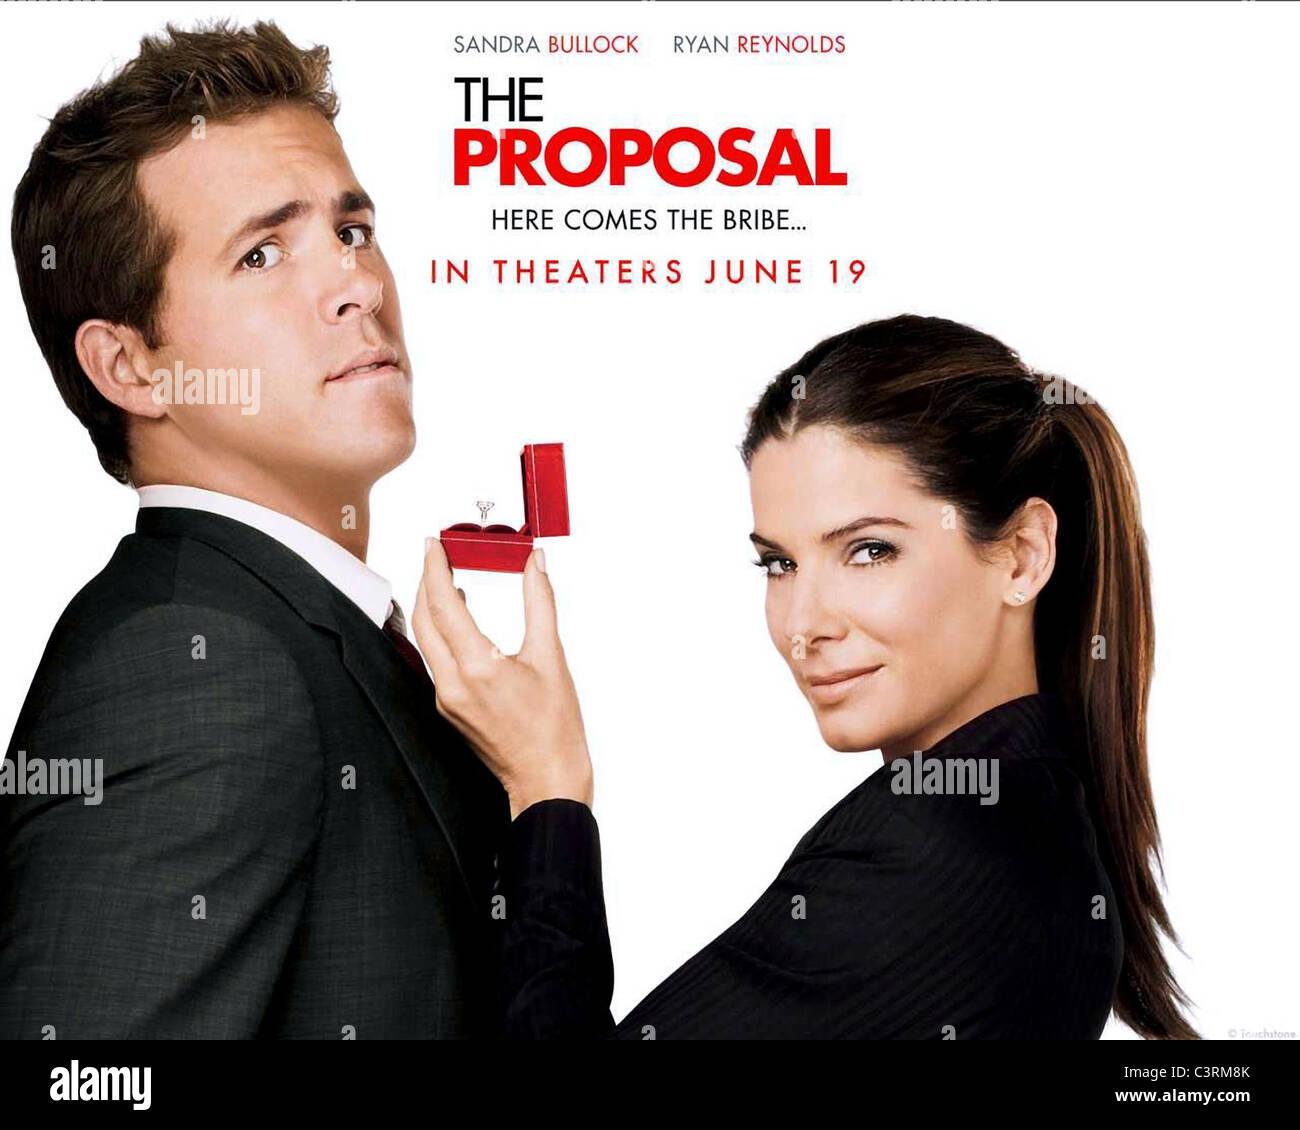 RYAN REYNOLDS & SANDRA BULLOCK POSTER THE PROPOSAL (2009